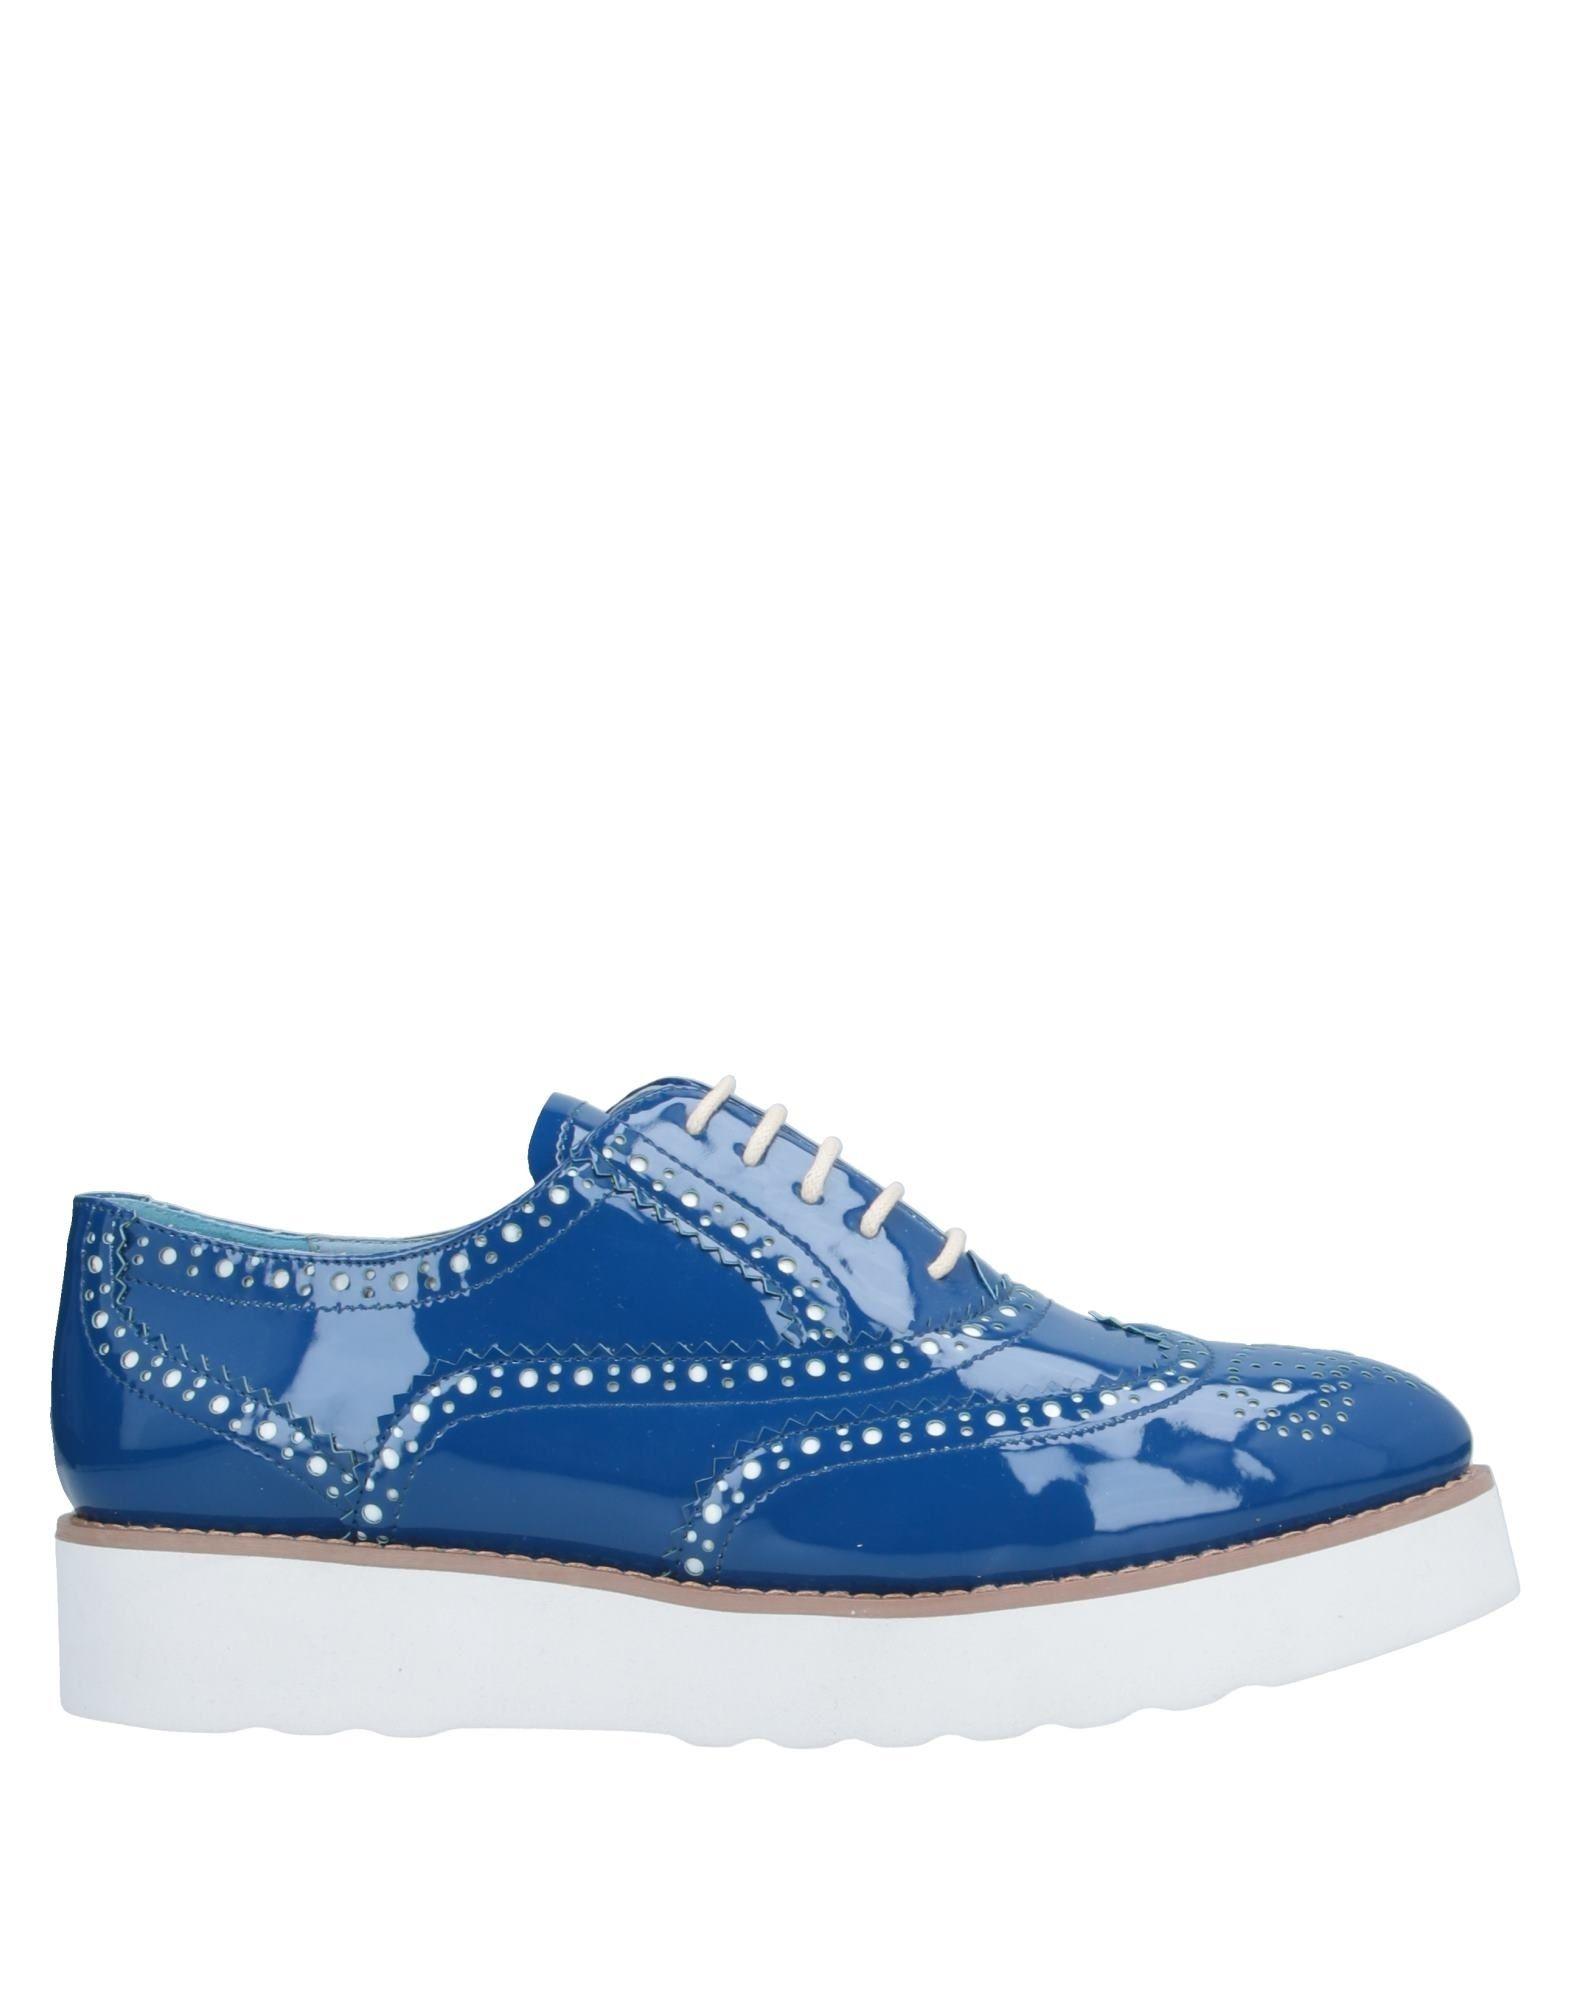 MASSIMO SANTINI Обувь на шнурках